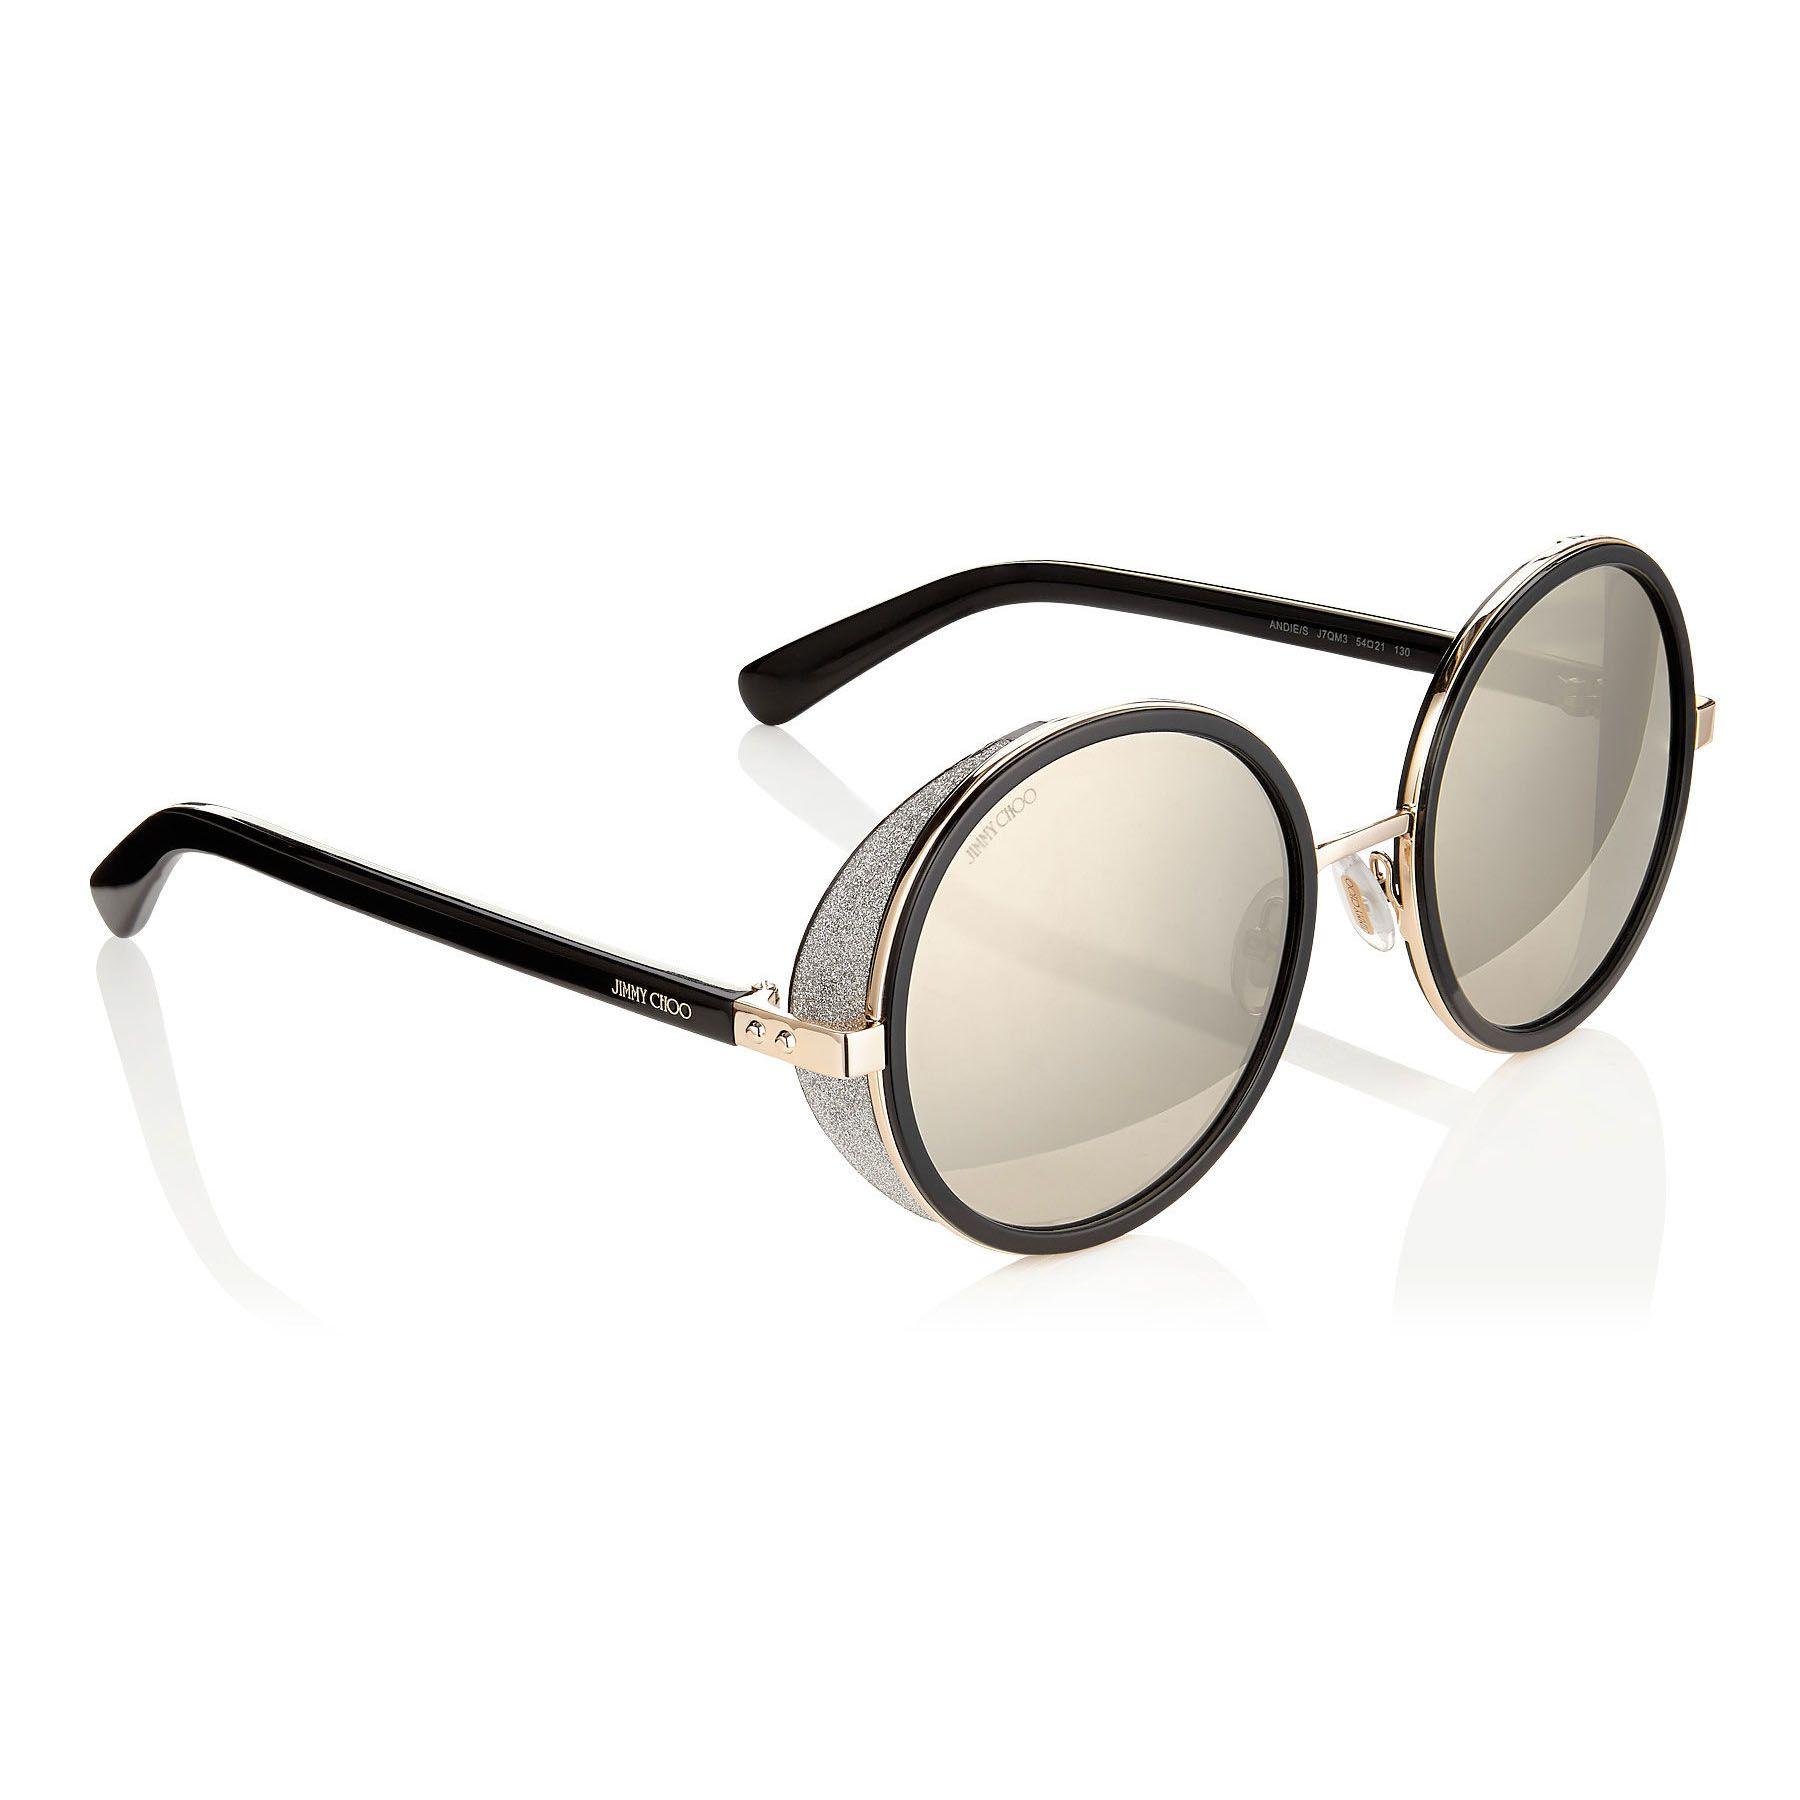 Óculos de Sol Jimmy Choo   Óculos de Sol Jimmy Choo Andie S-J7Q 26c3f0aed2